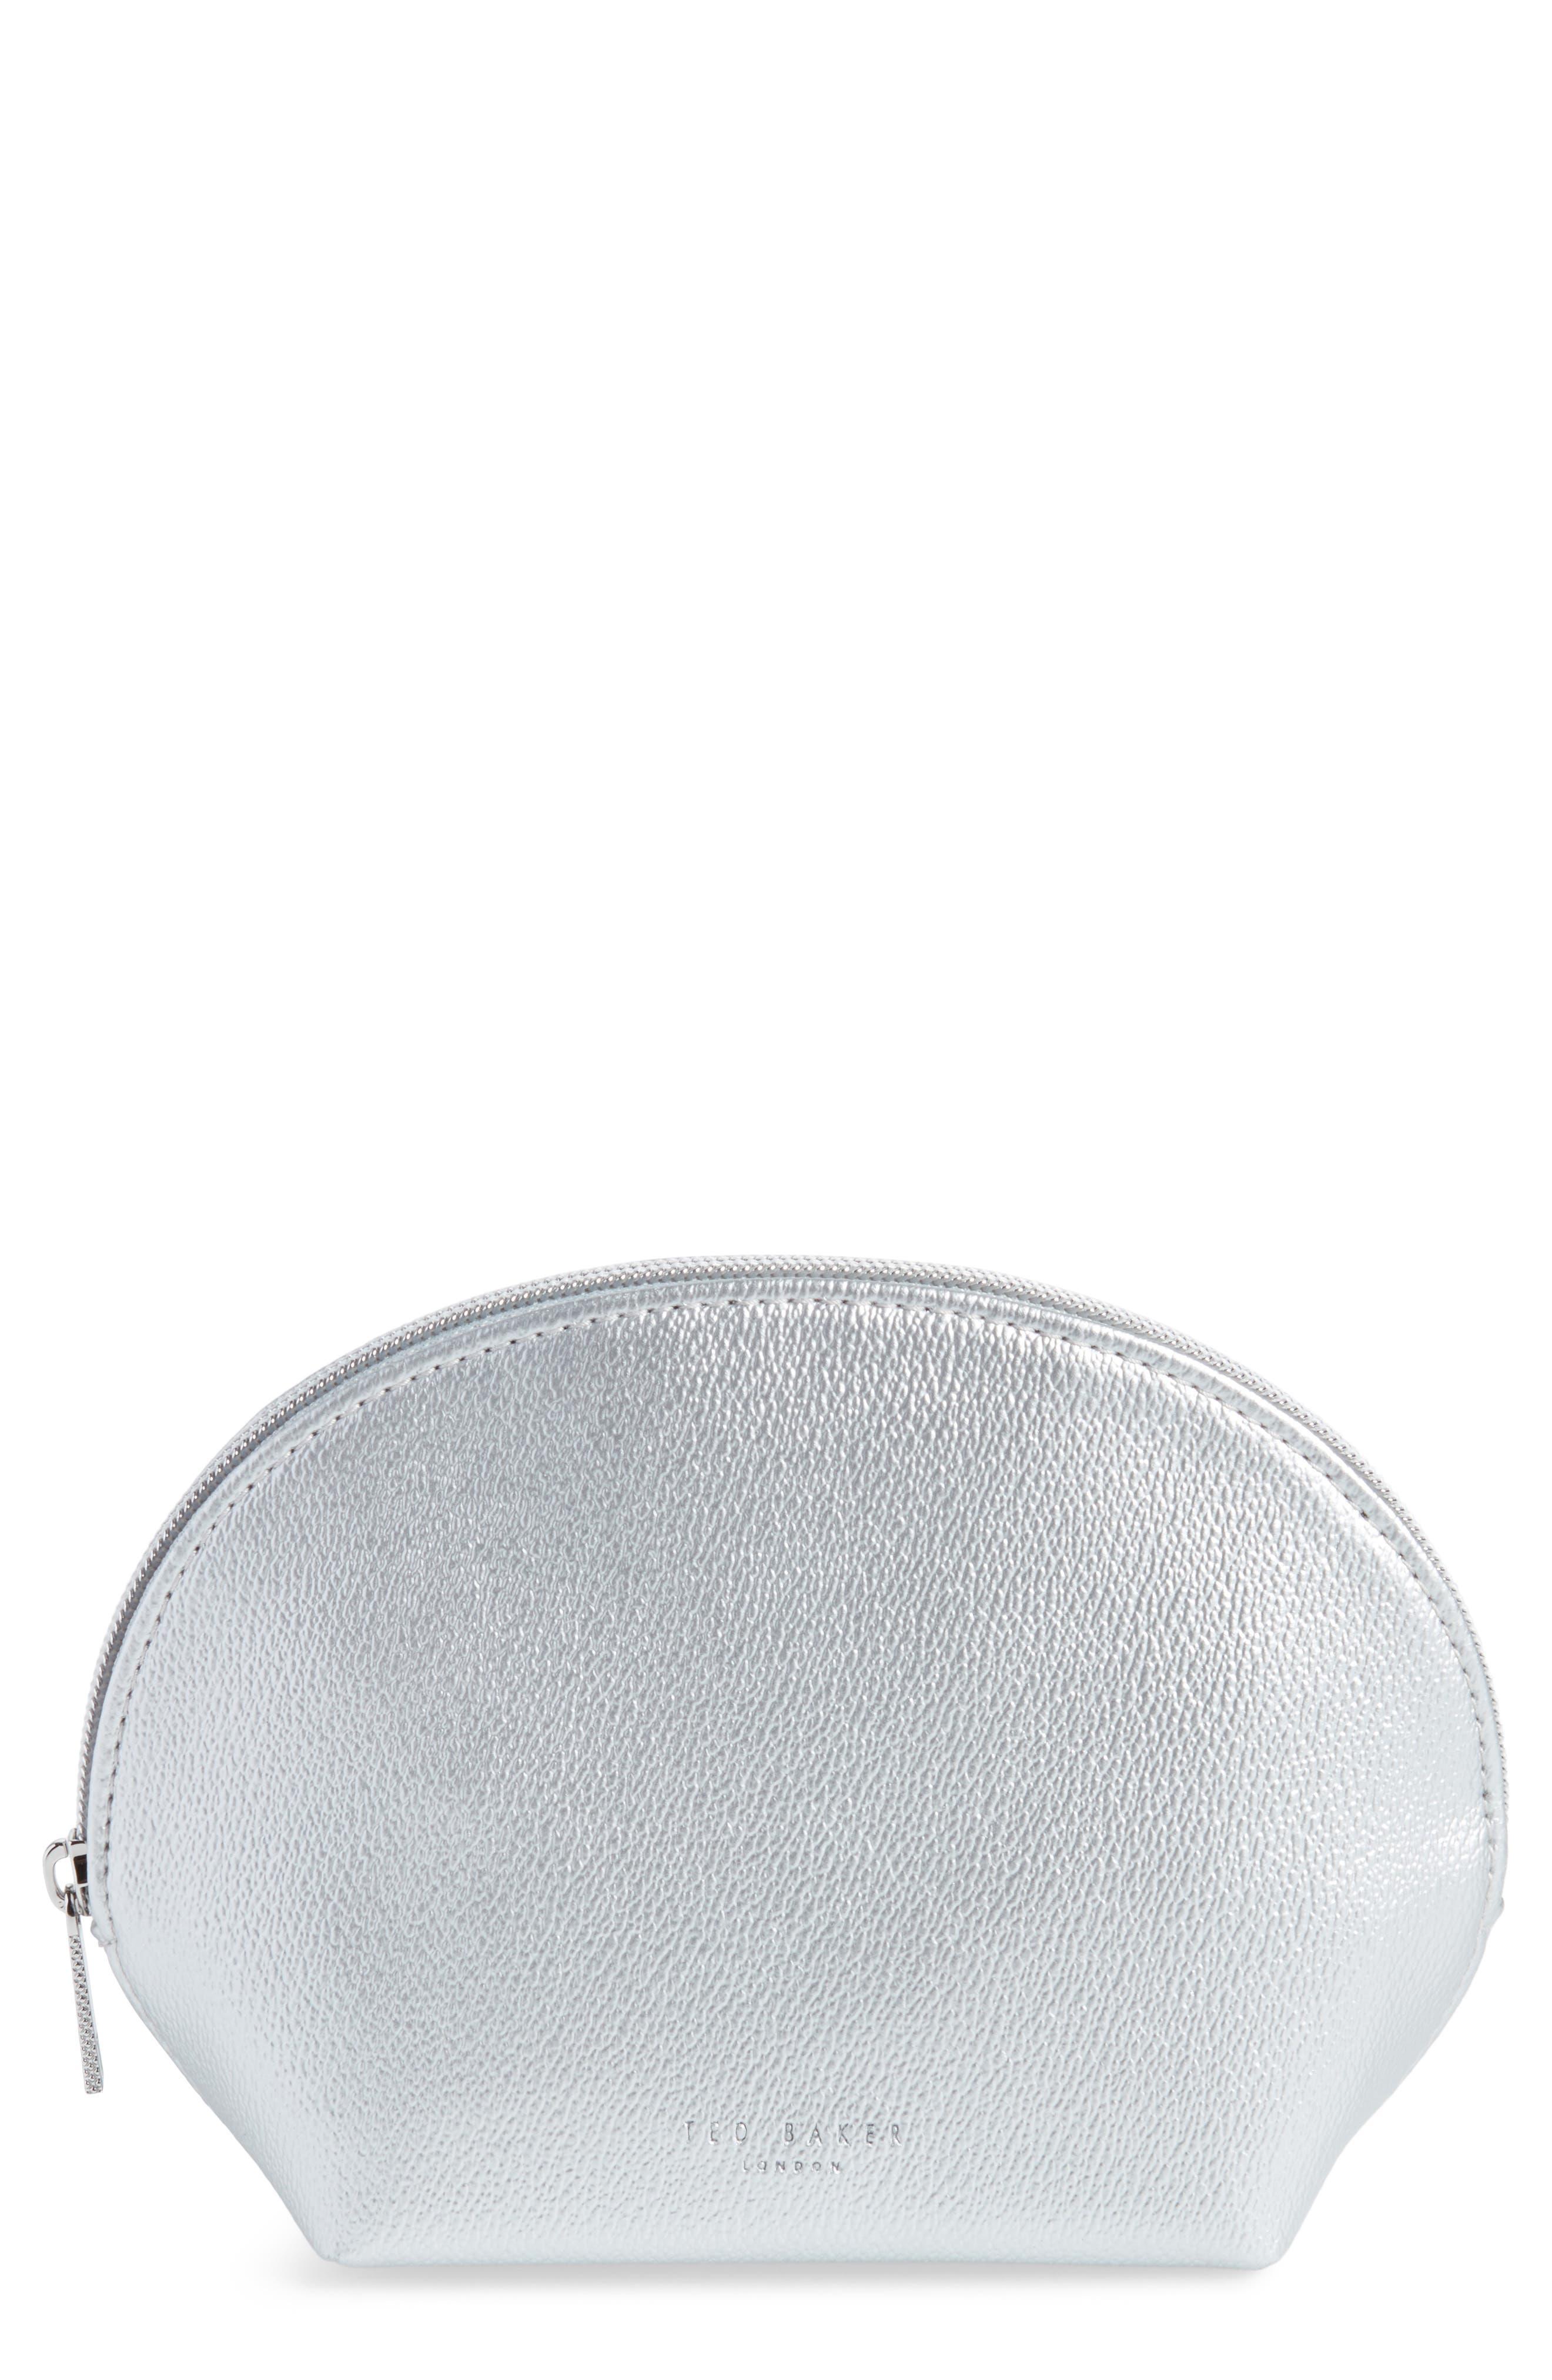 Faux Leather Zip Pouch - Metallic, Silver